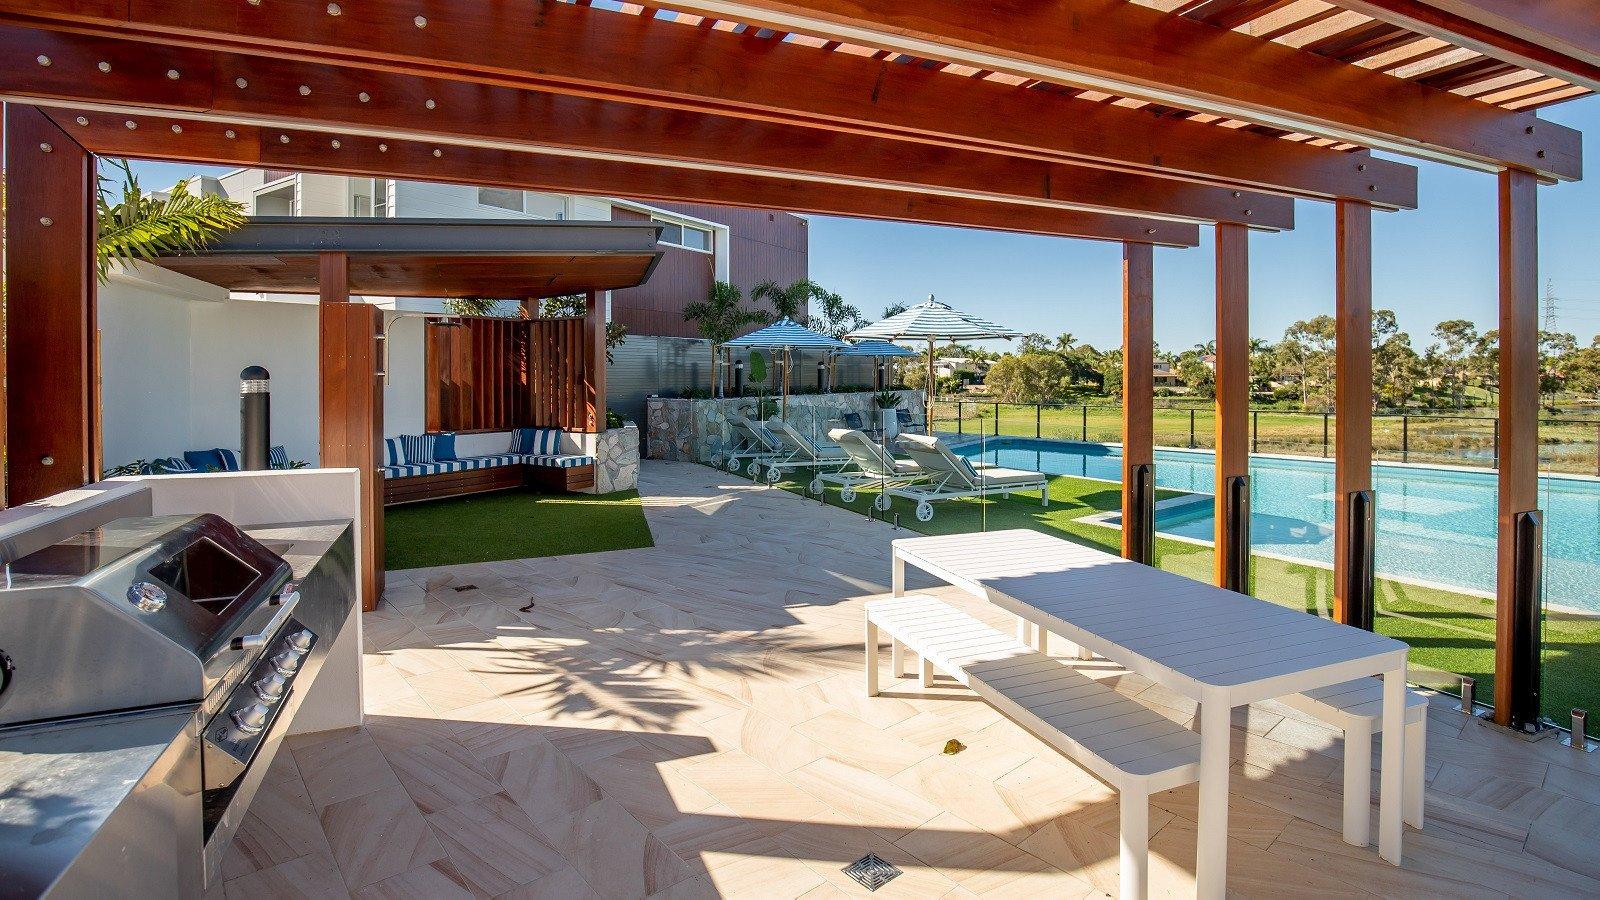 Vue Terrace Homes-image-10